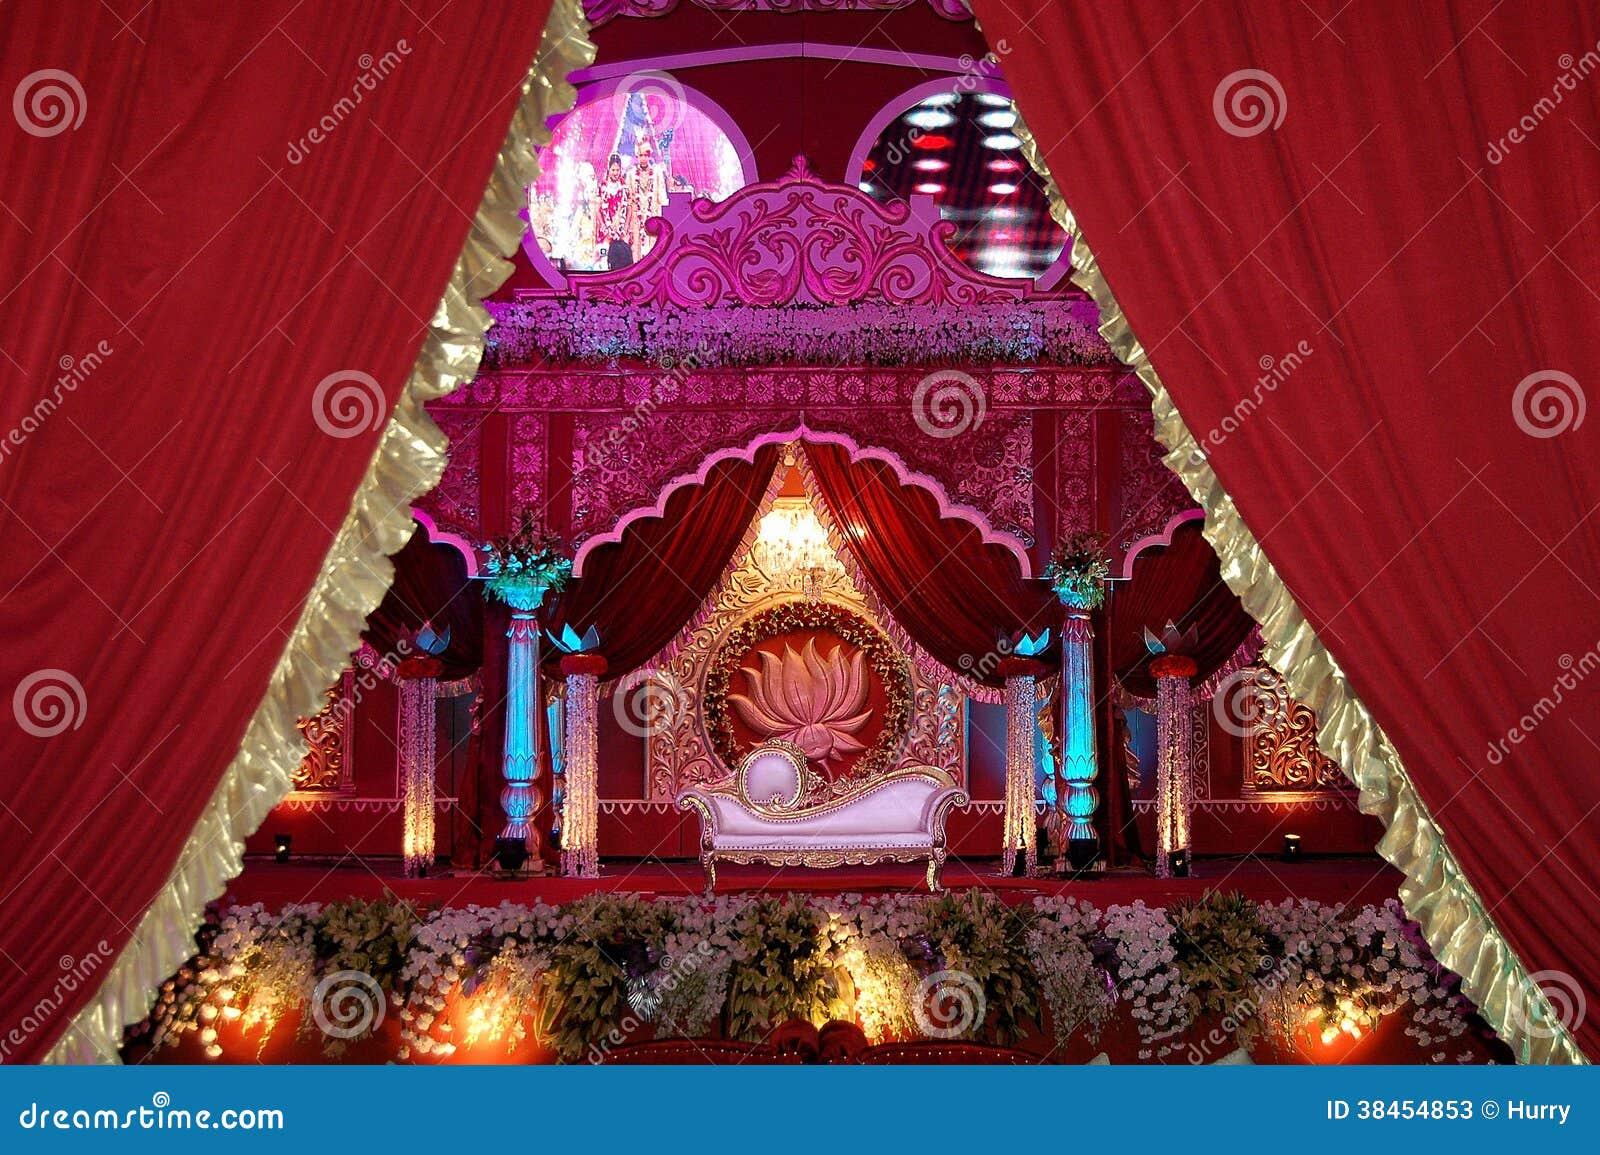 indian wedding stage mandap stock photos  image 38454853